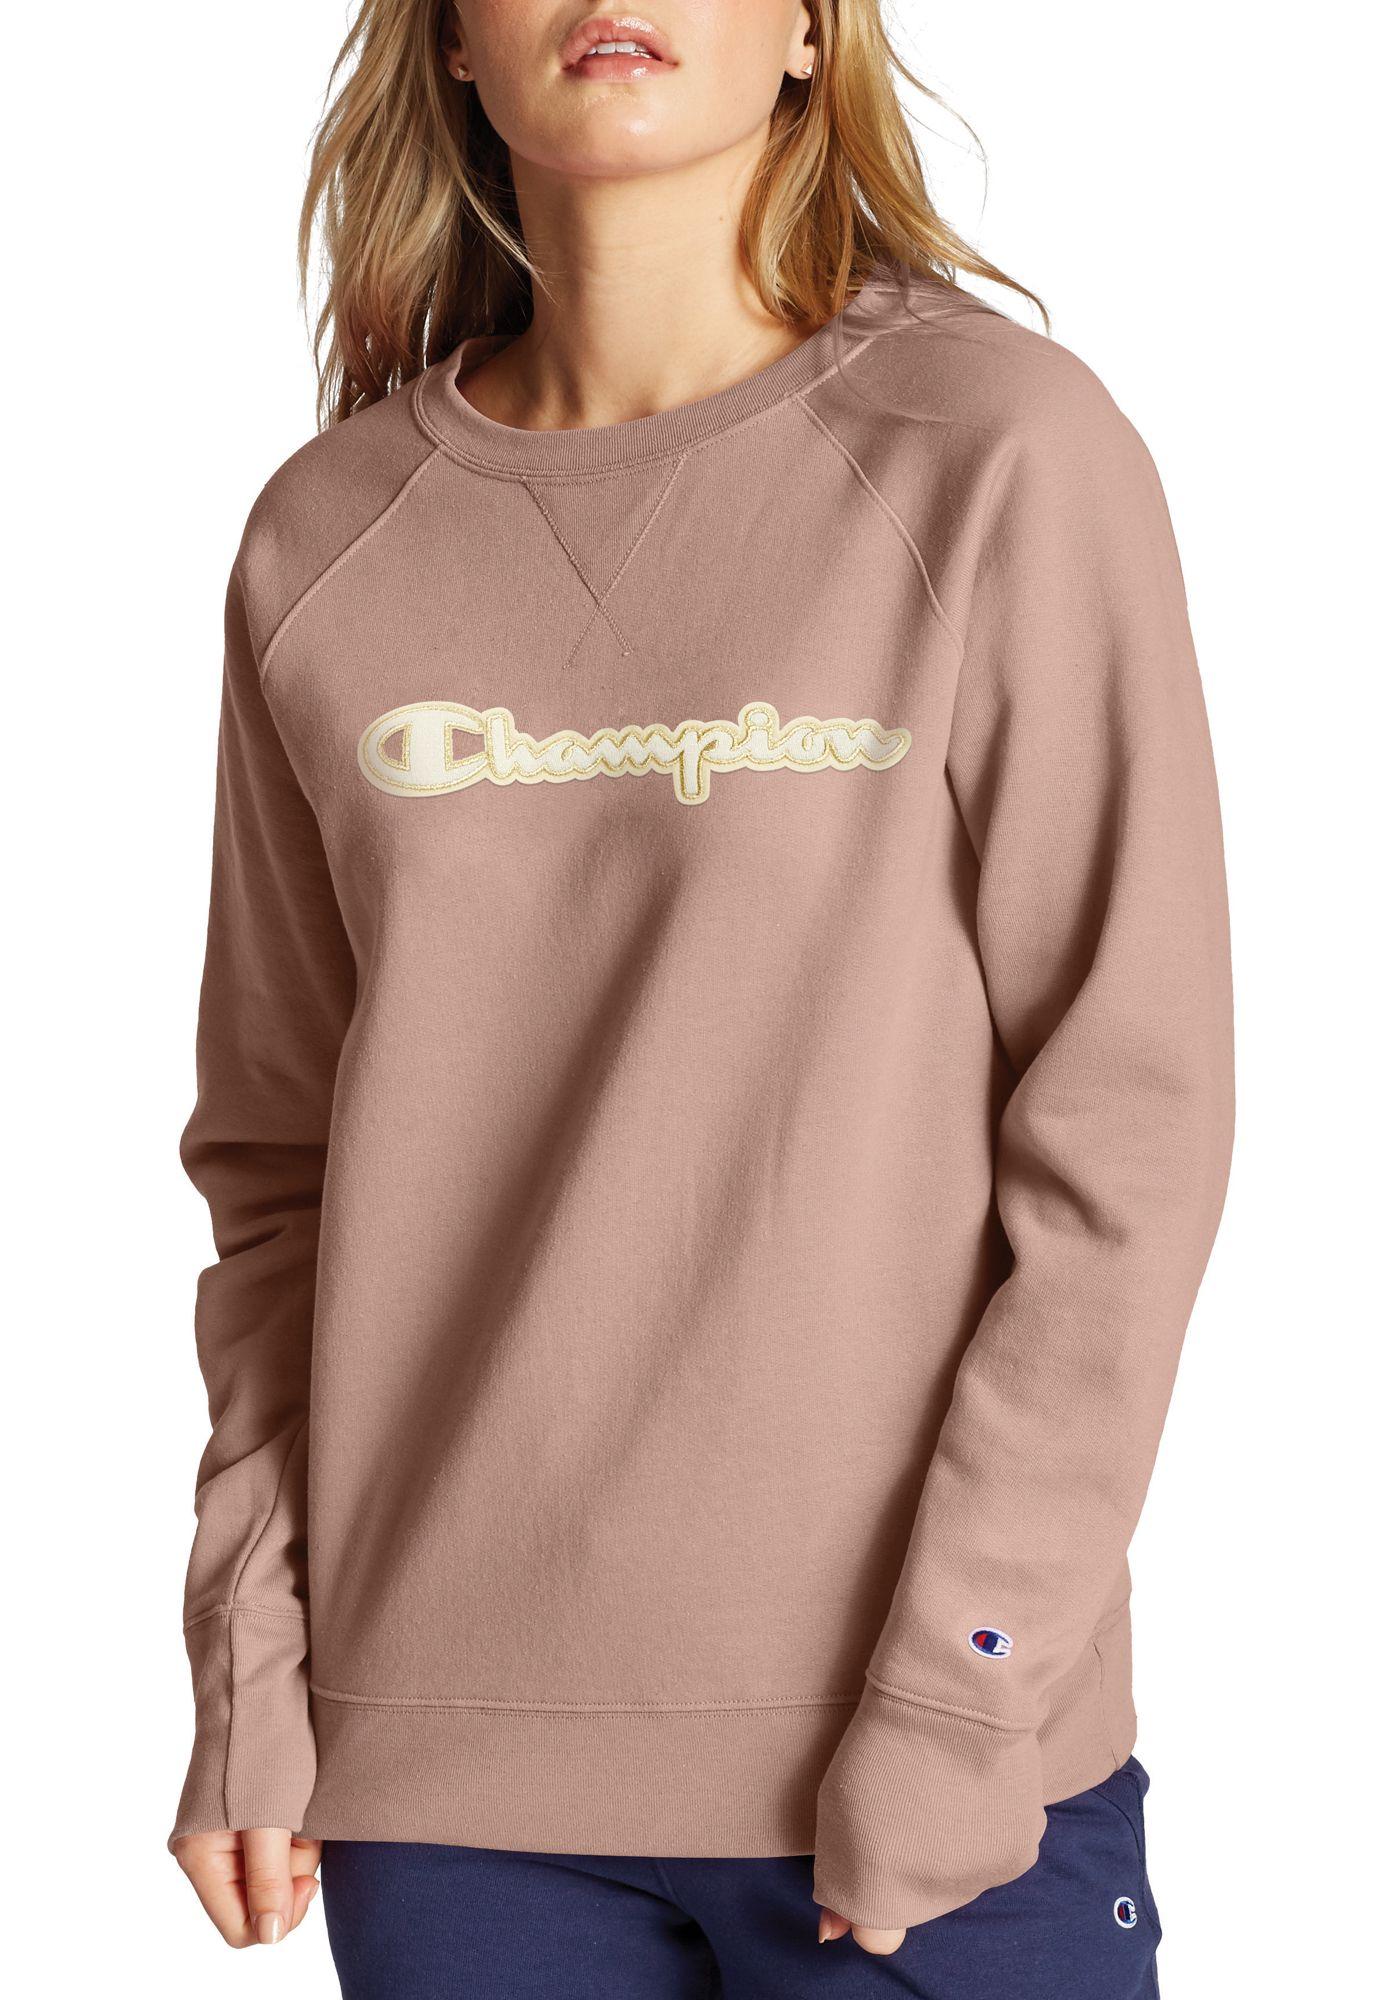 Champion Women's Applique Boyfriend Crew Top